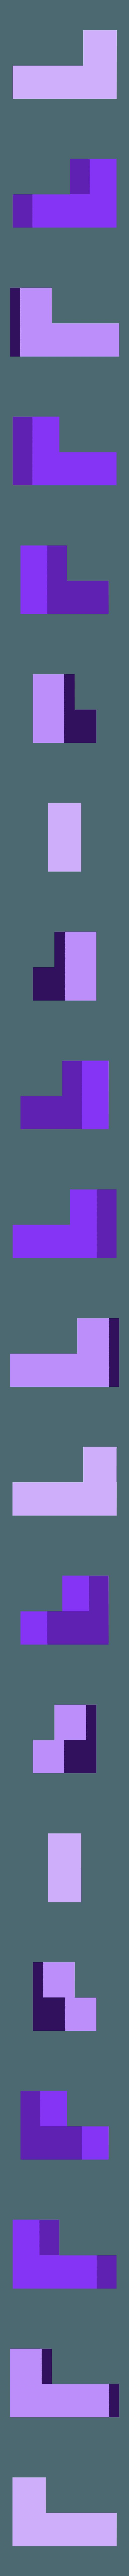 Twins_C_x_2.stl Download free STL file Puzzle - Triple twins • 3D print model, dancingchicken